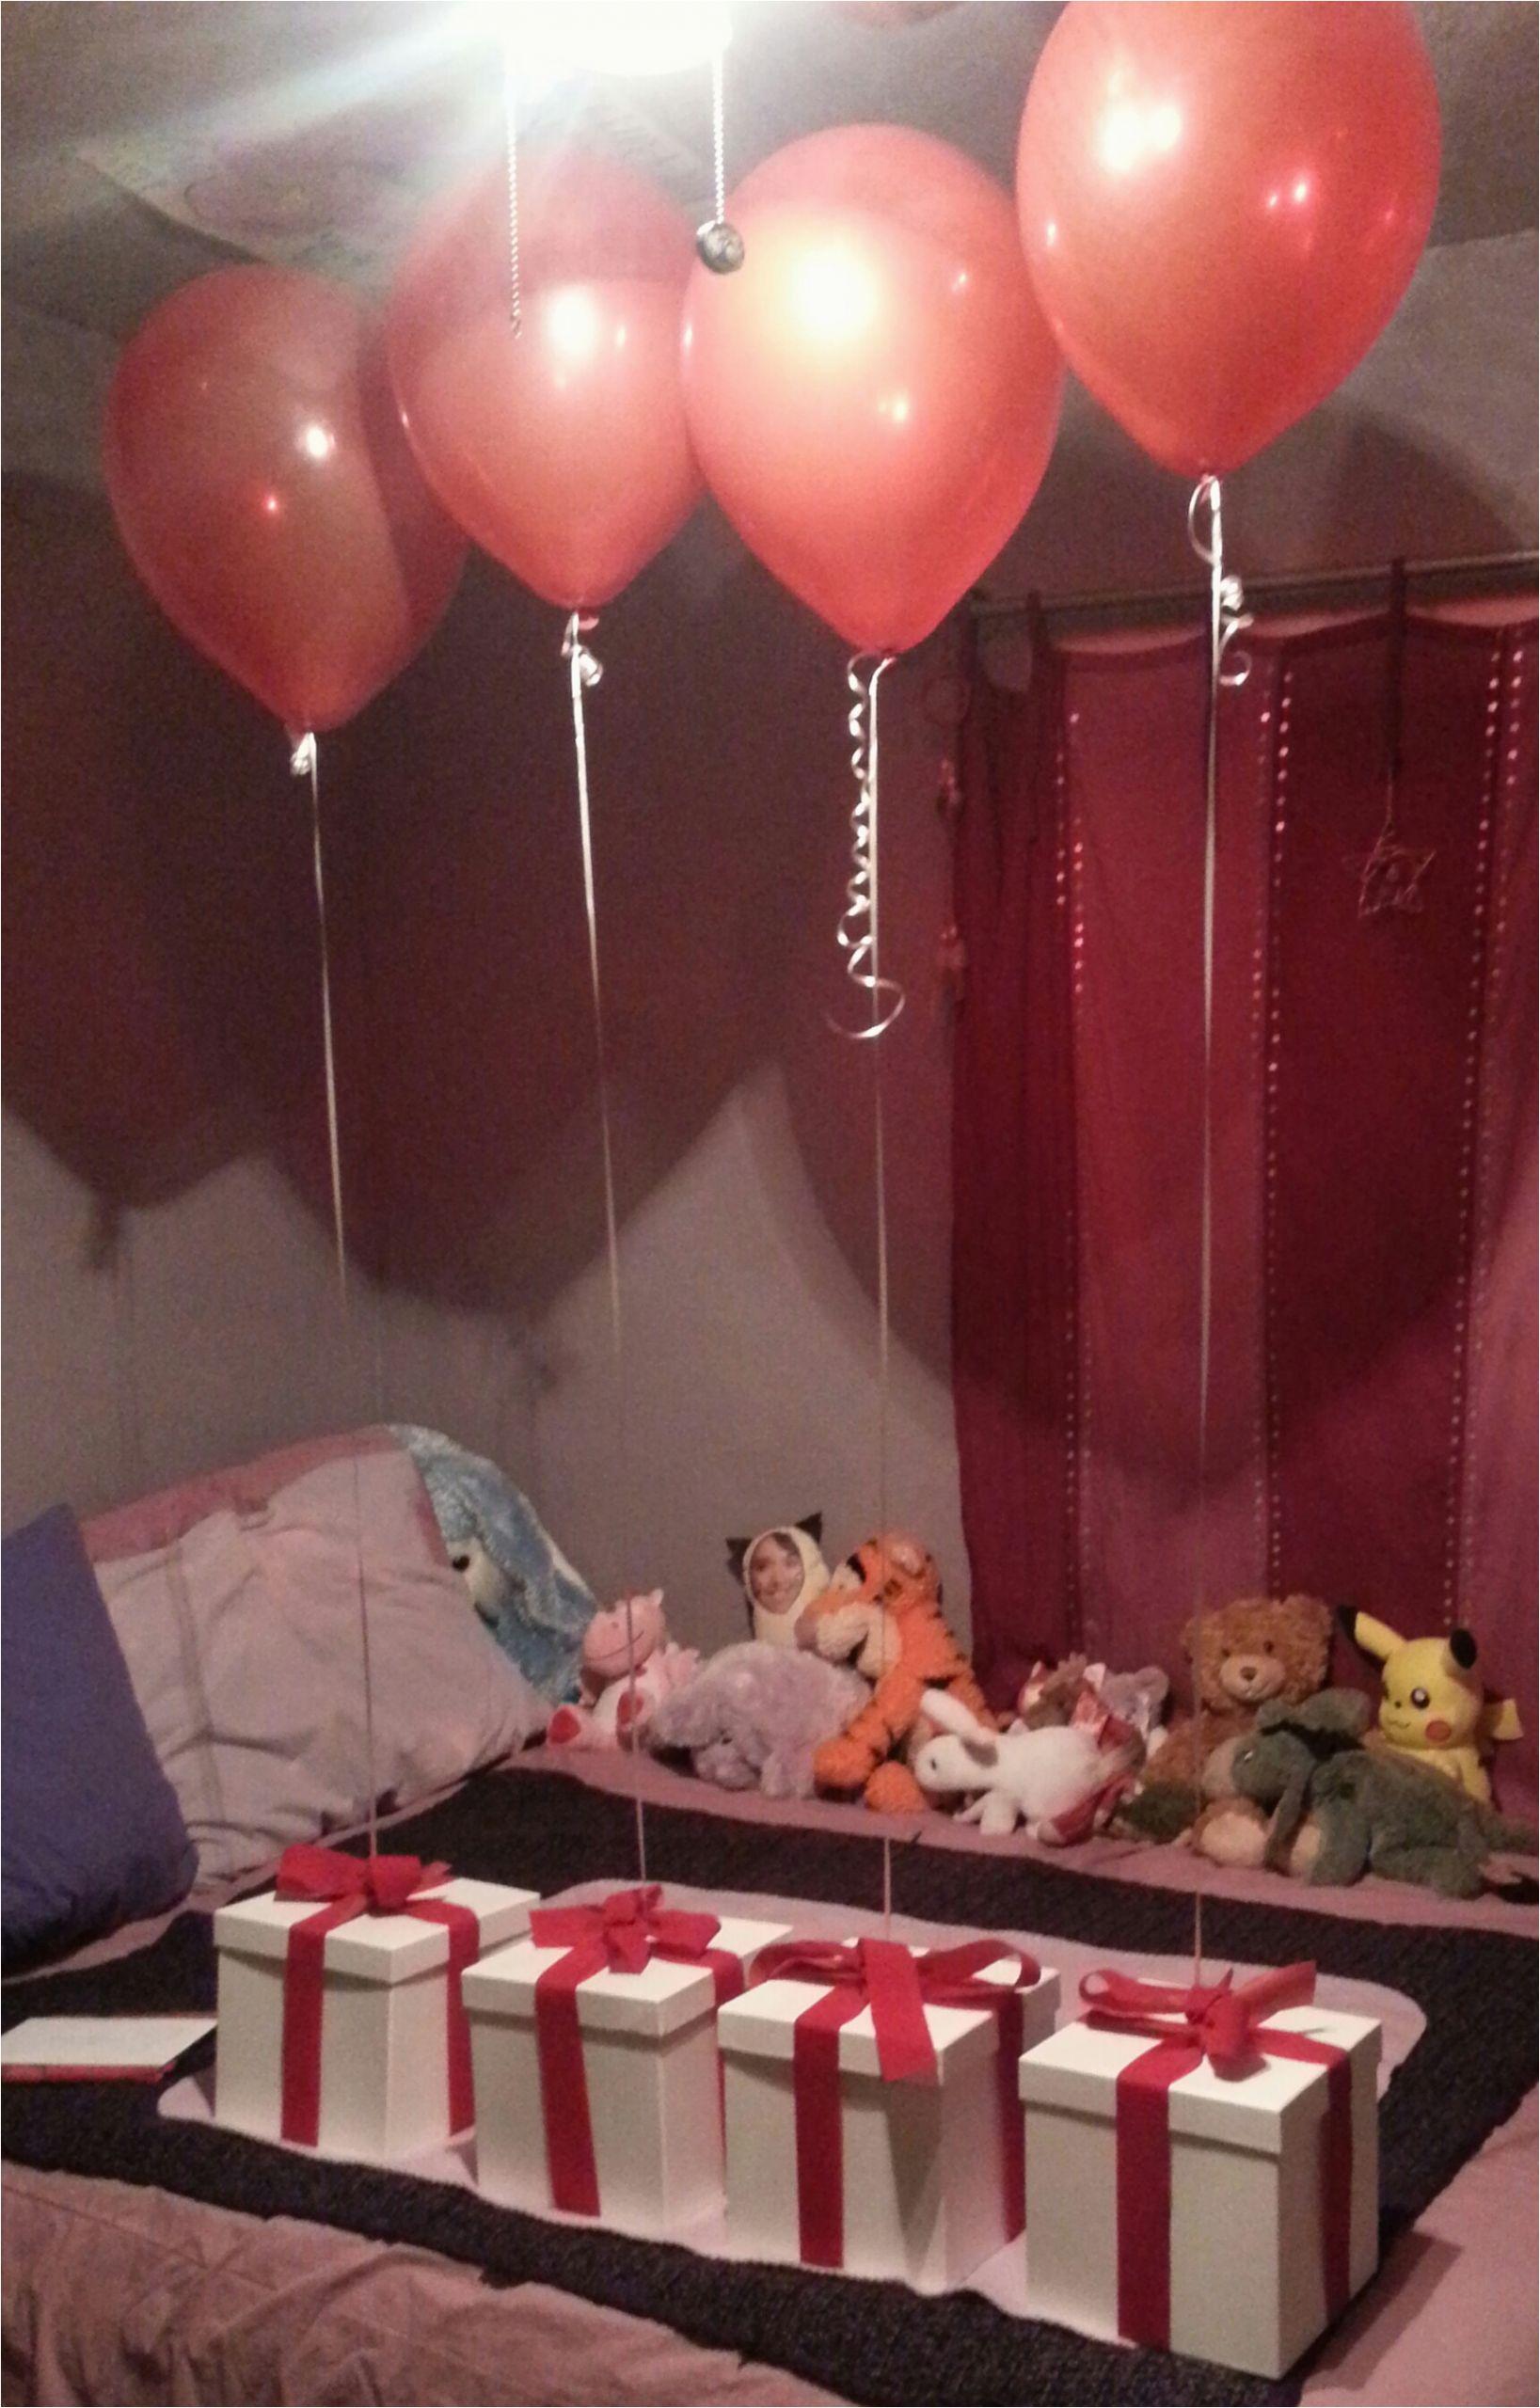 Birthday Ideas for Boyfriend Creative Creative Birthday Ideas for Boyfriend Examples and forms